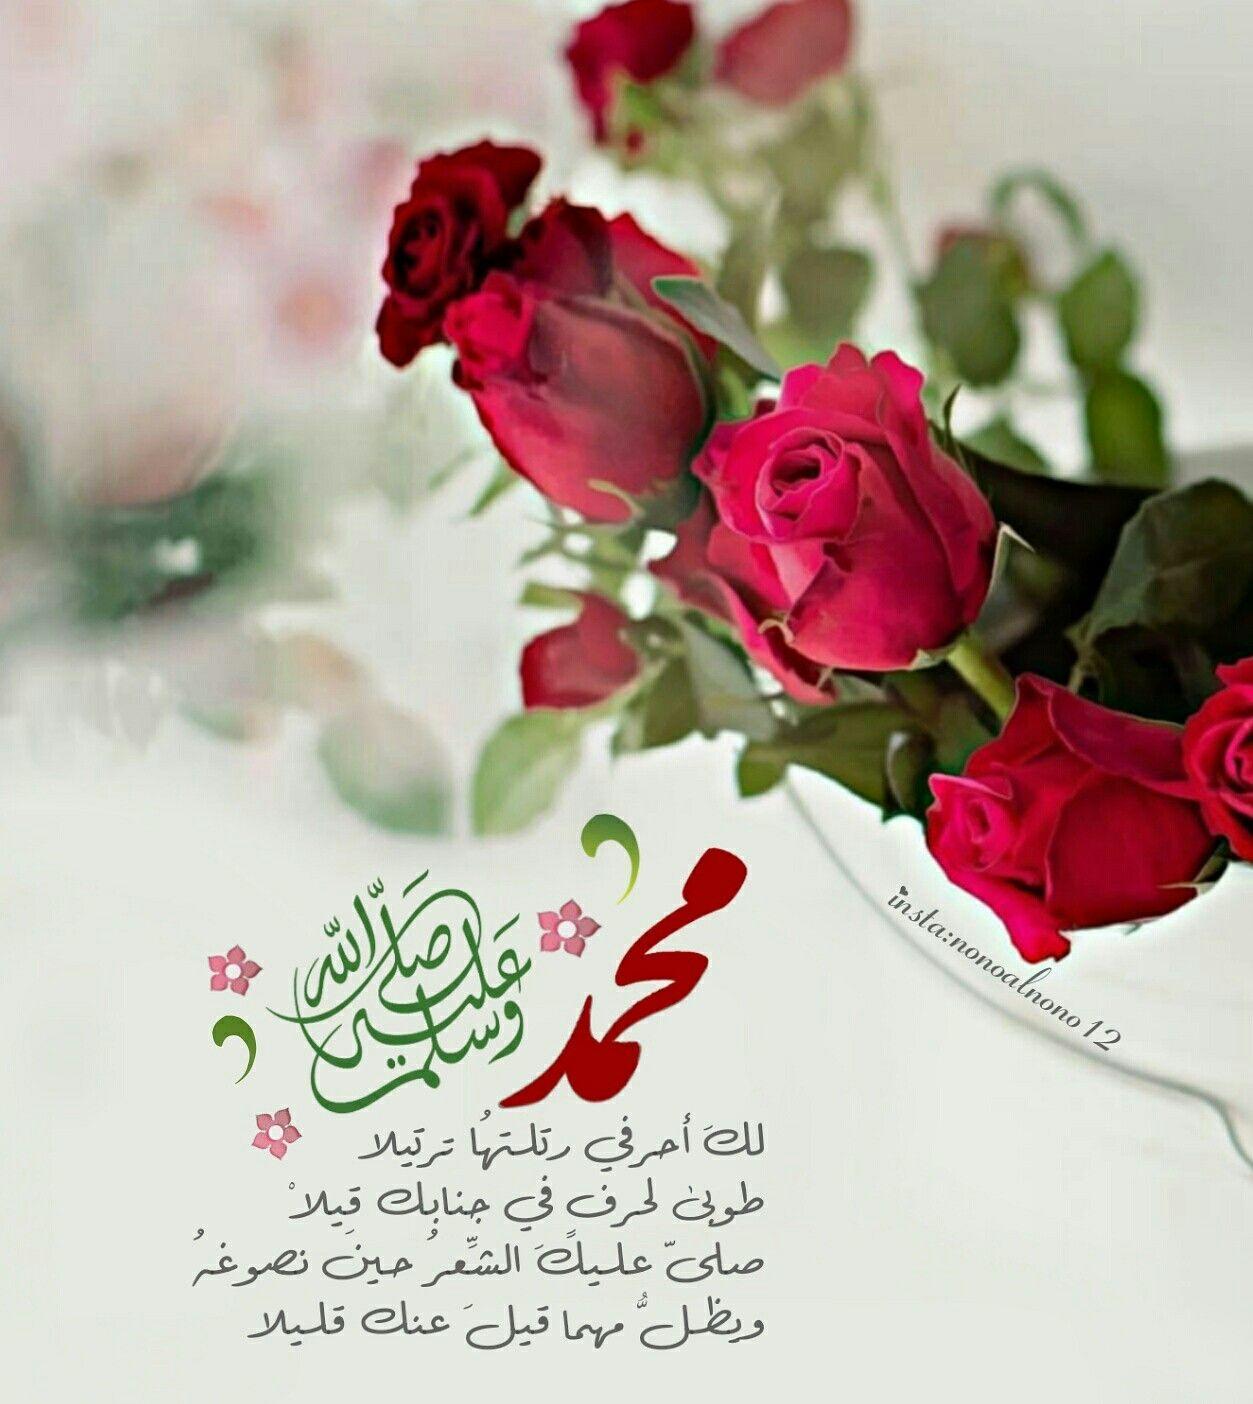 Desertrose صلوا على الحبيب المصطفى Islamic Quotes Wallpaper Islamic Images Quran Wallpaper